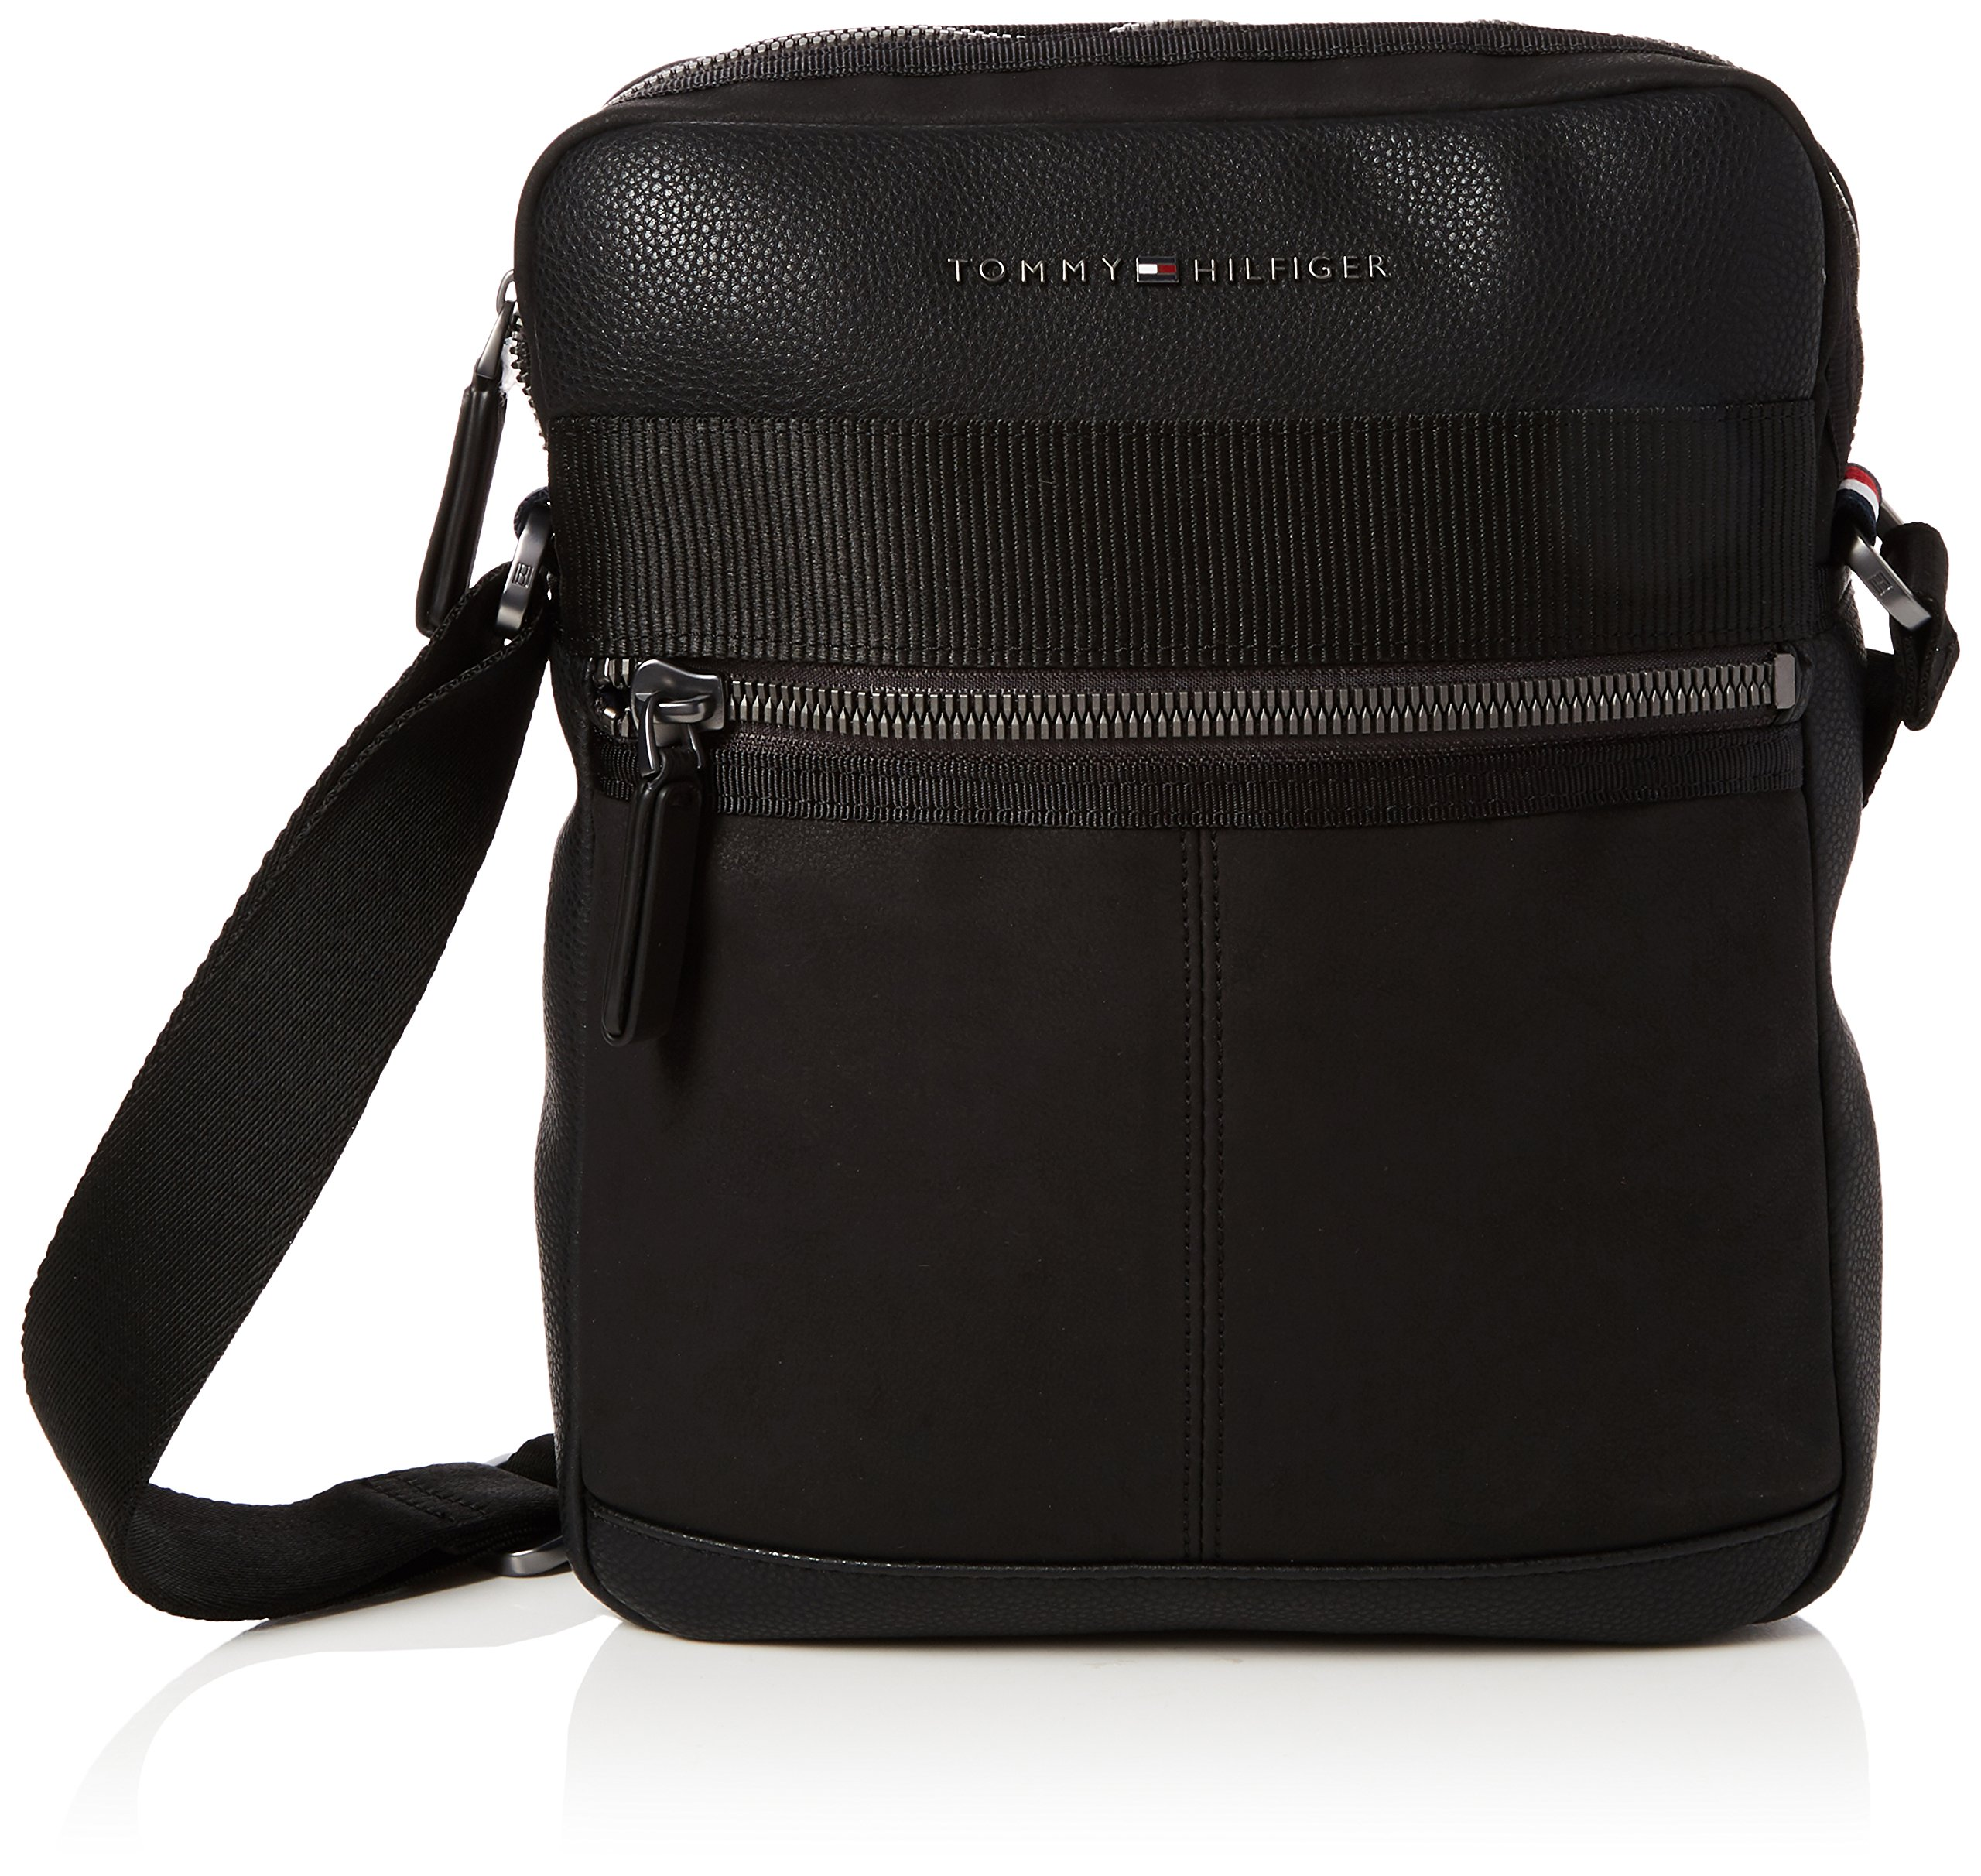 Tommy Hilfiger – Playful Novelty Reporter, Shoppers y bolsos de hombro Hombre, Negro (Black), 6x28x23 cm (B x H T)